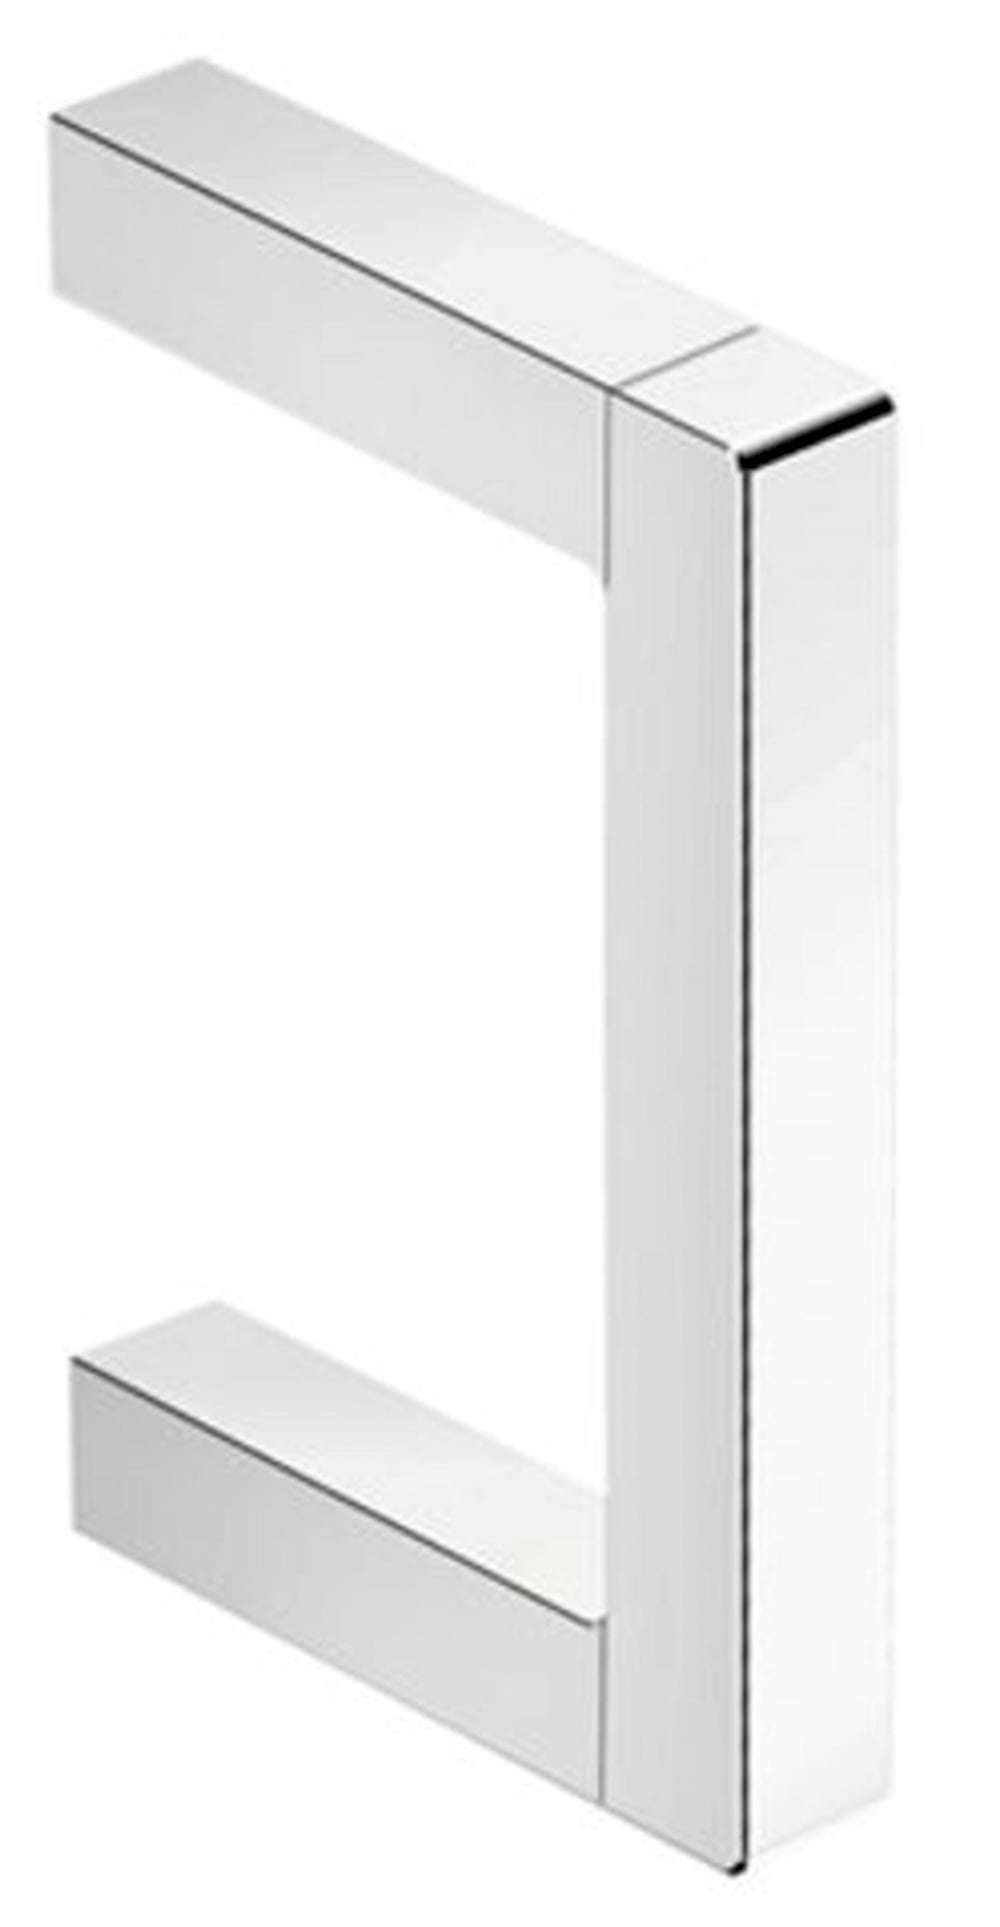 Accessoires HEWI Haltegriff System 100